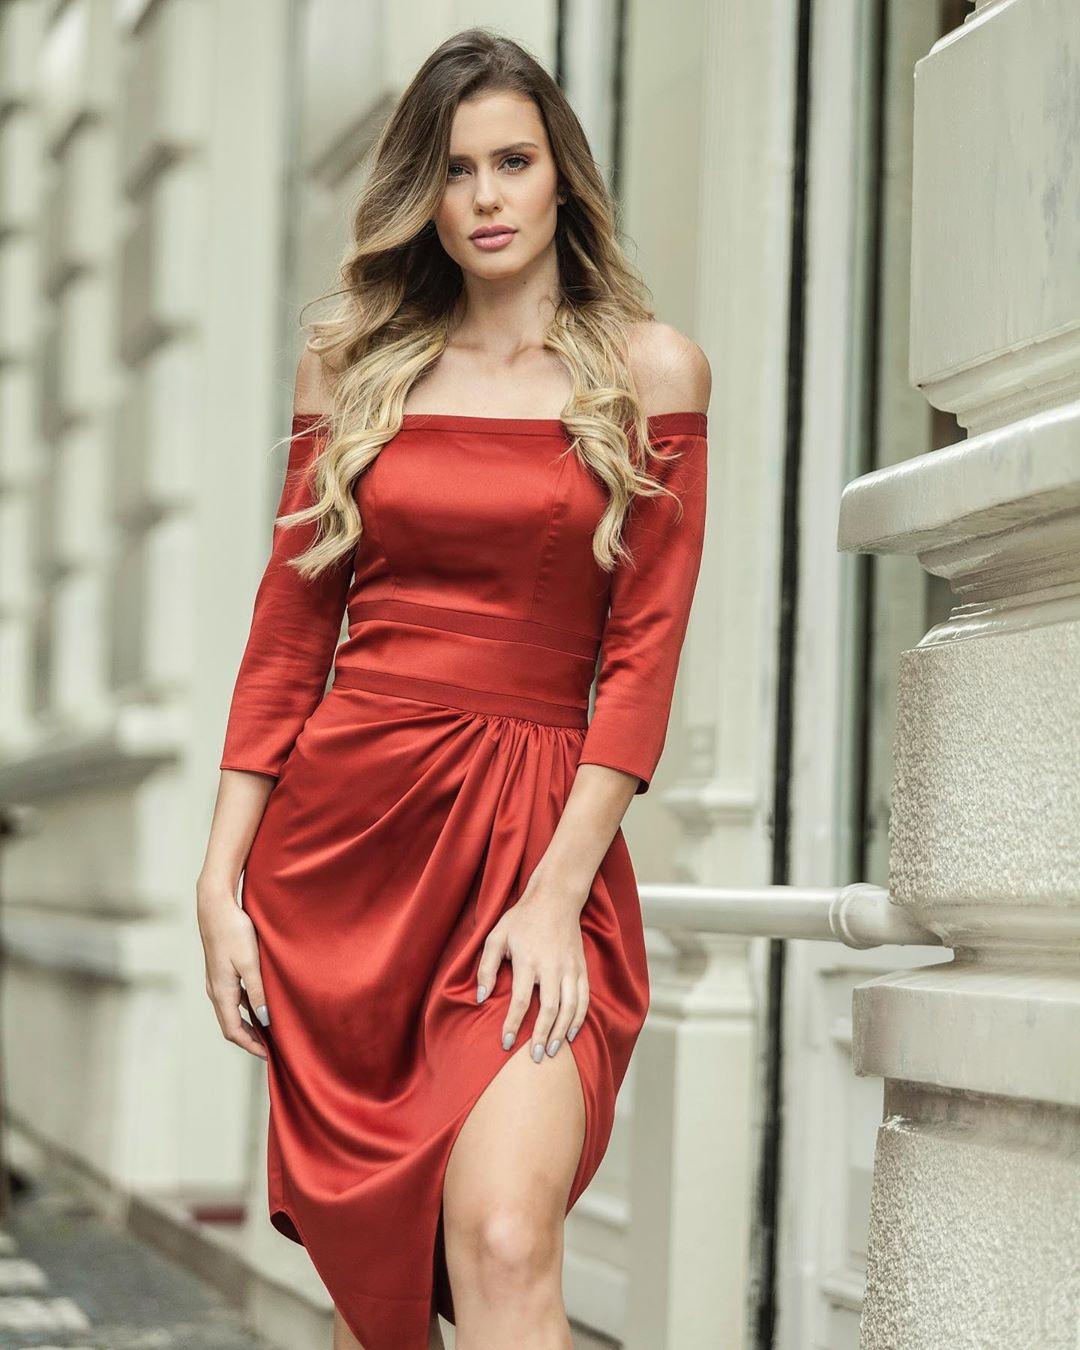 marcella kozinski de barros, 3rd runner-up de miss tourism world 2019. 66800310